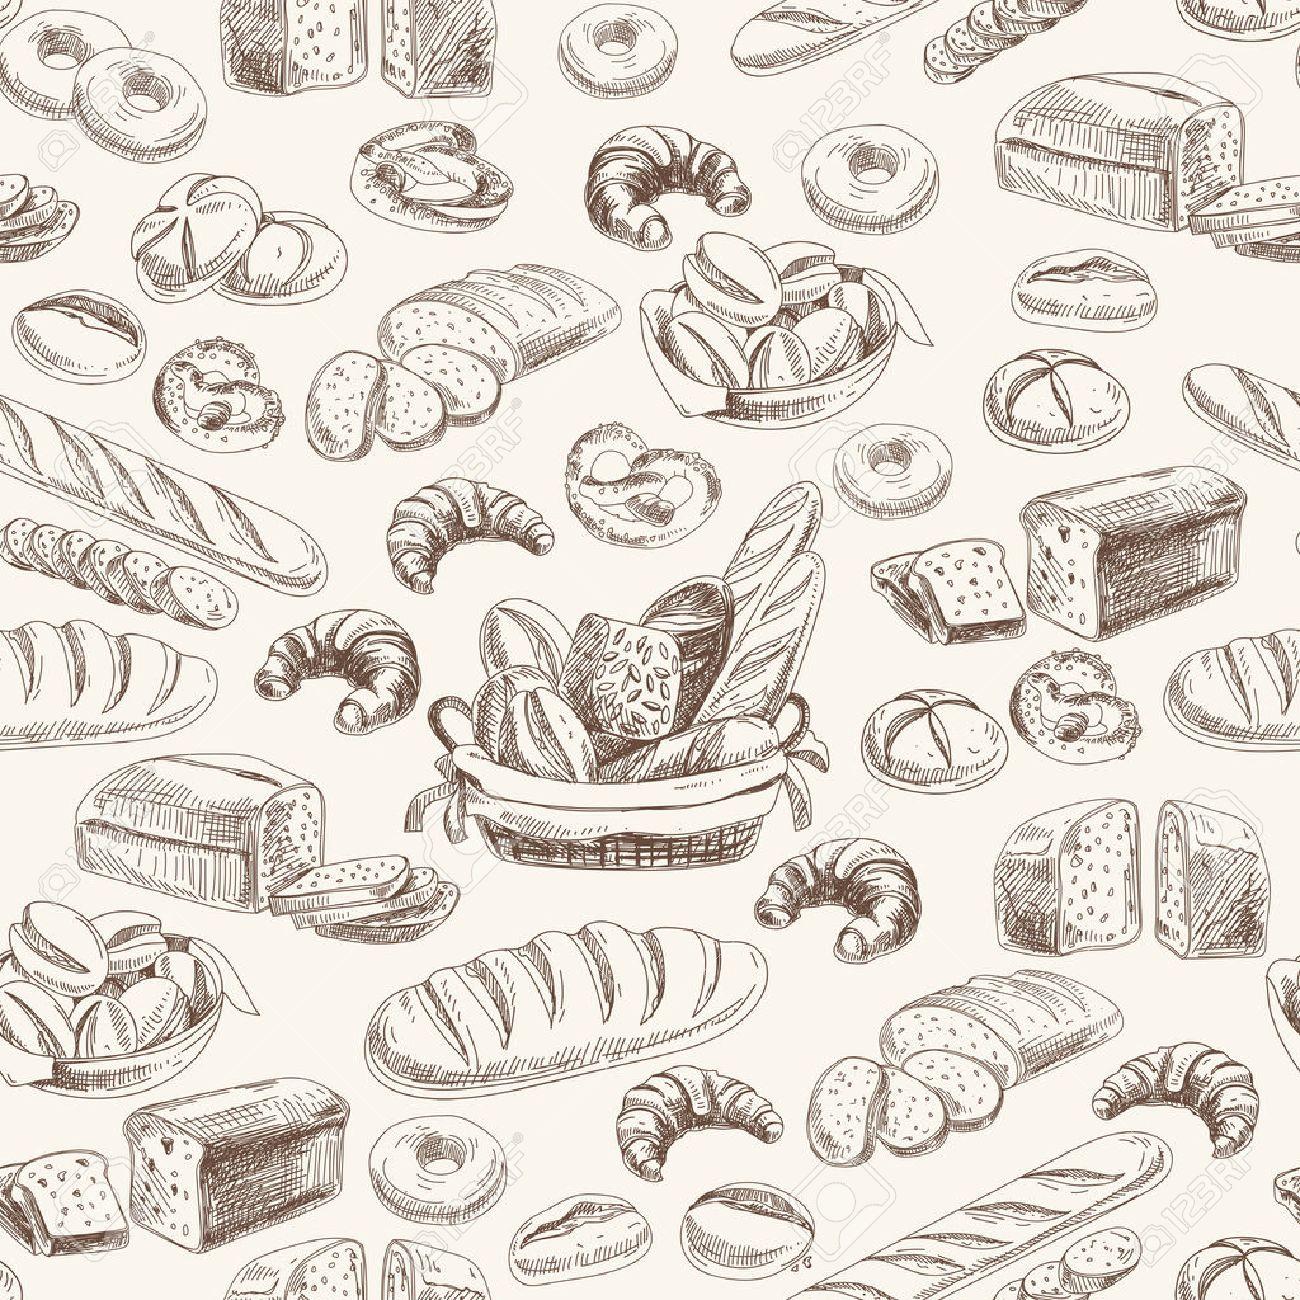 Vector bakery retro seamlrss pattern. Vintage Illustration. Sketch - 49424383